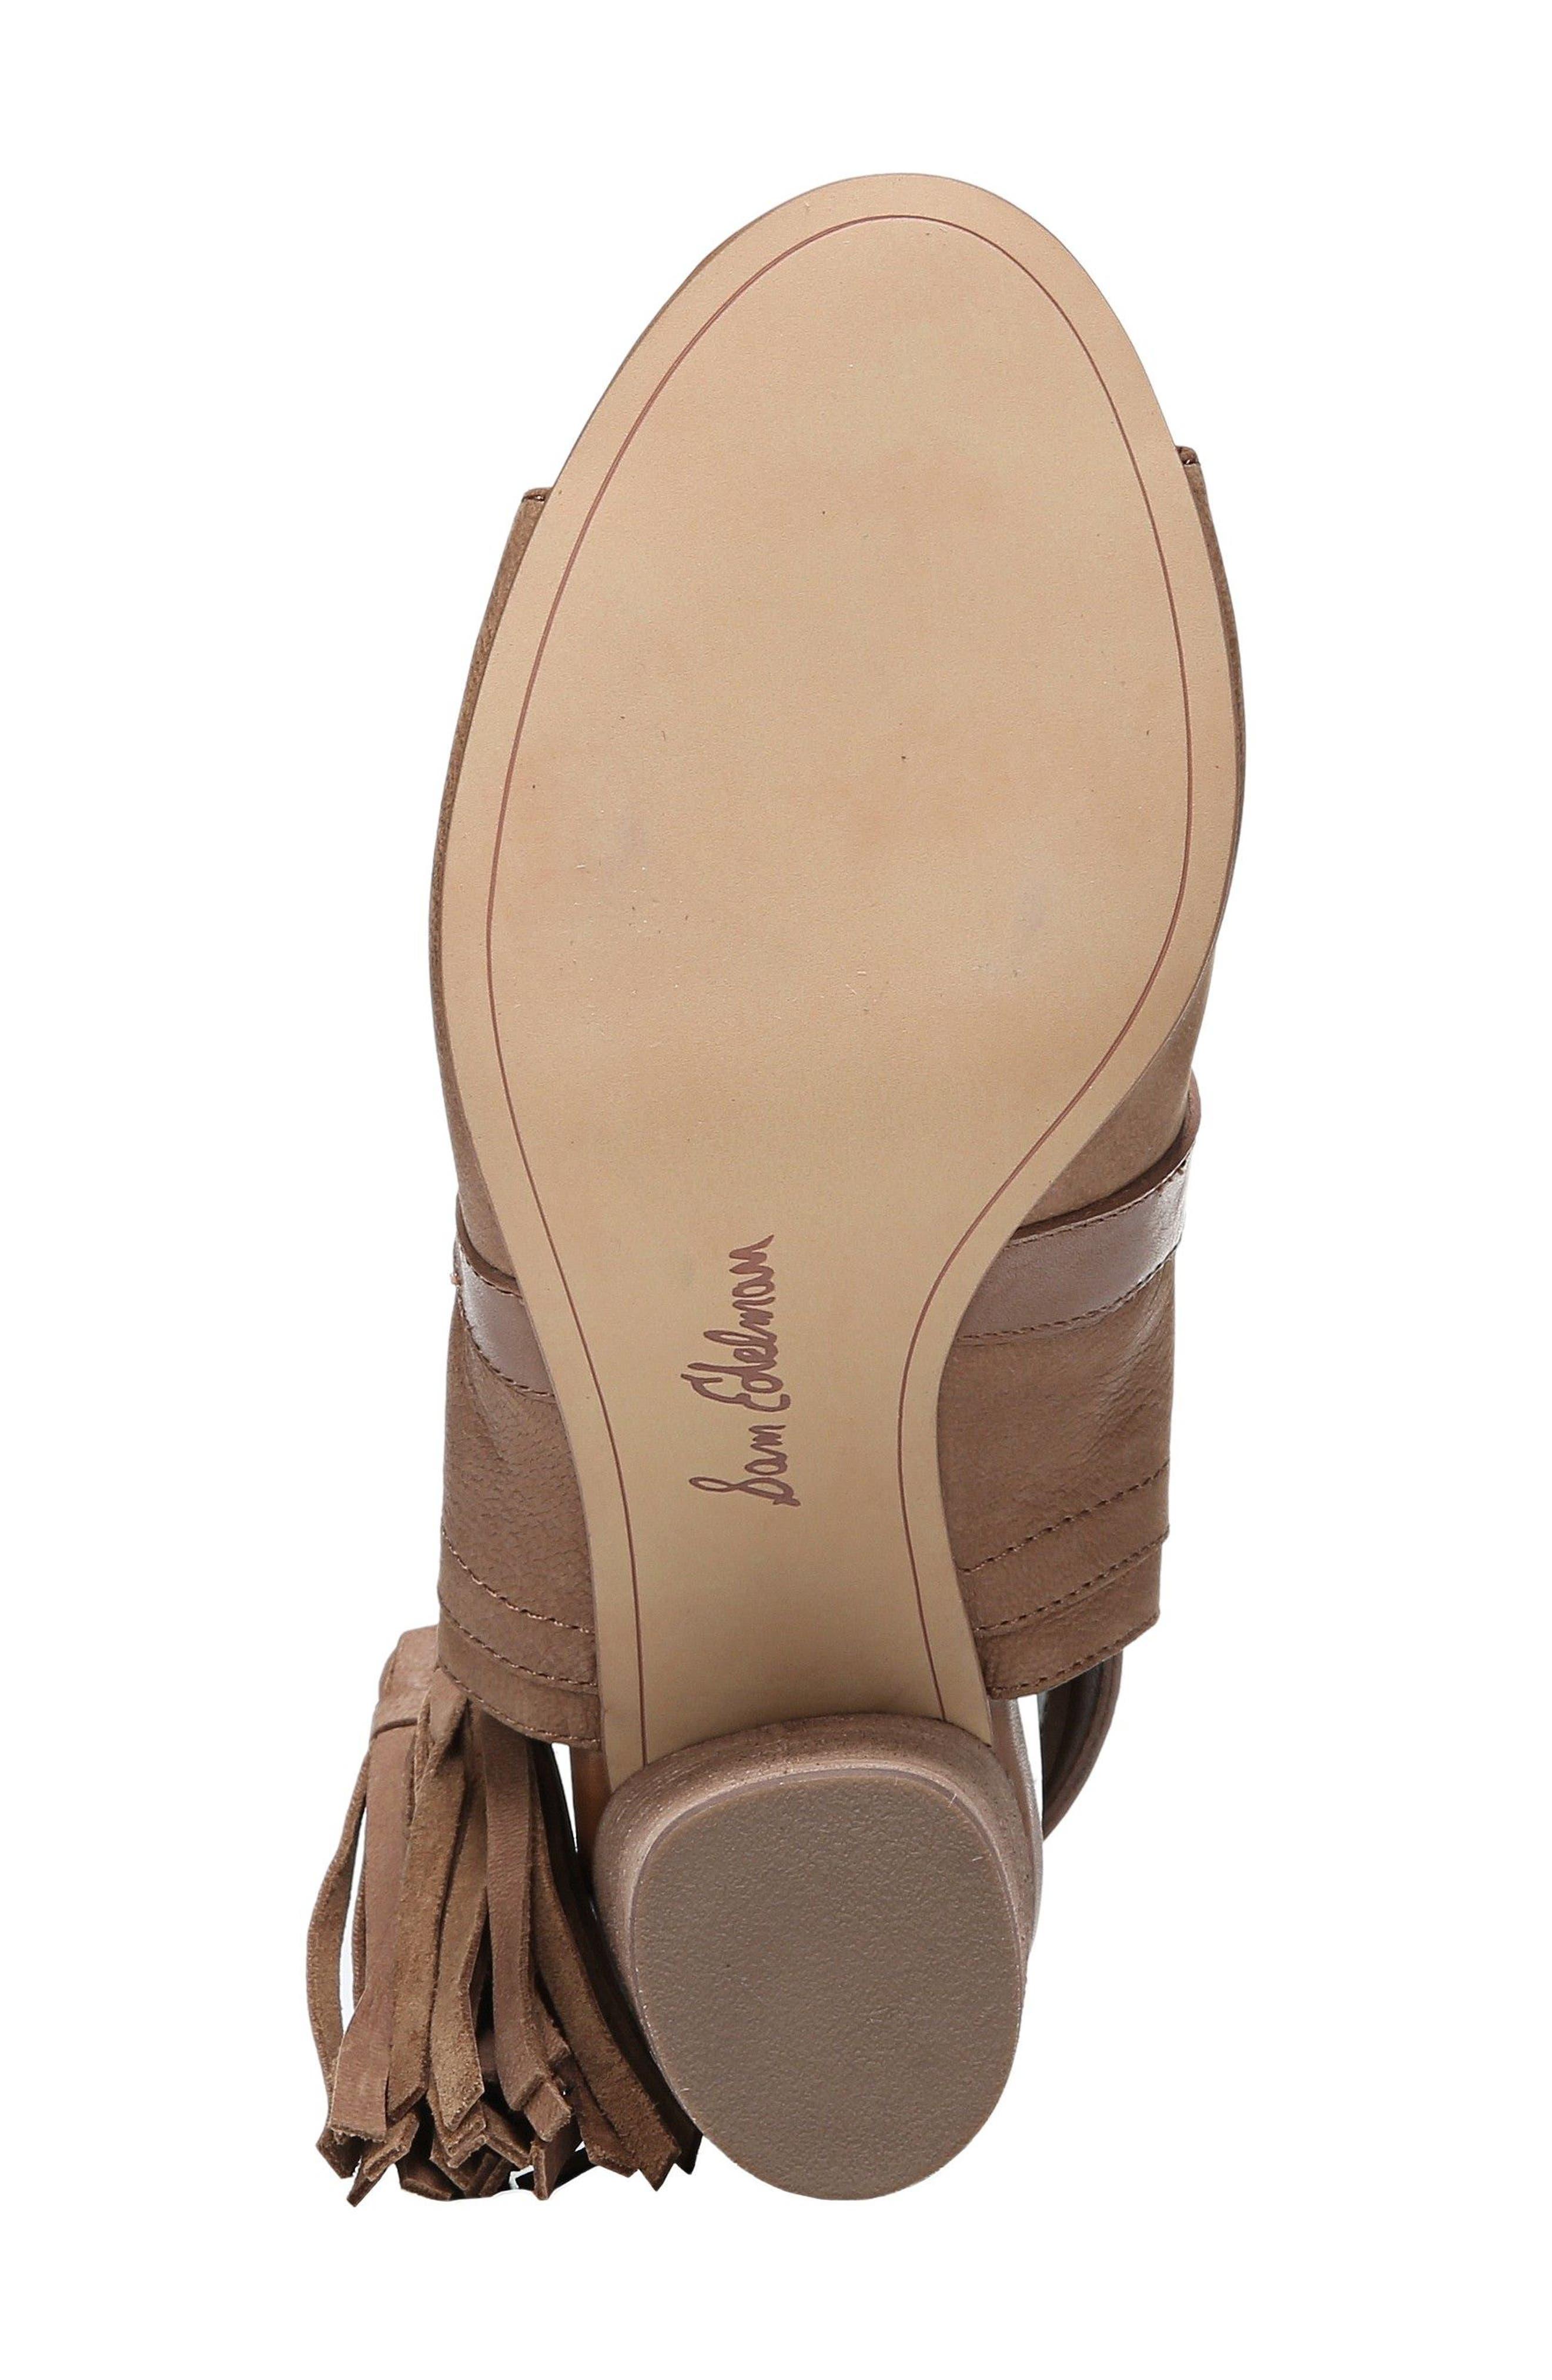 Vermont Block Heel Sandal,                             Alternate thumbnail 6, color,                             Deep Saddle Nubuck Leather